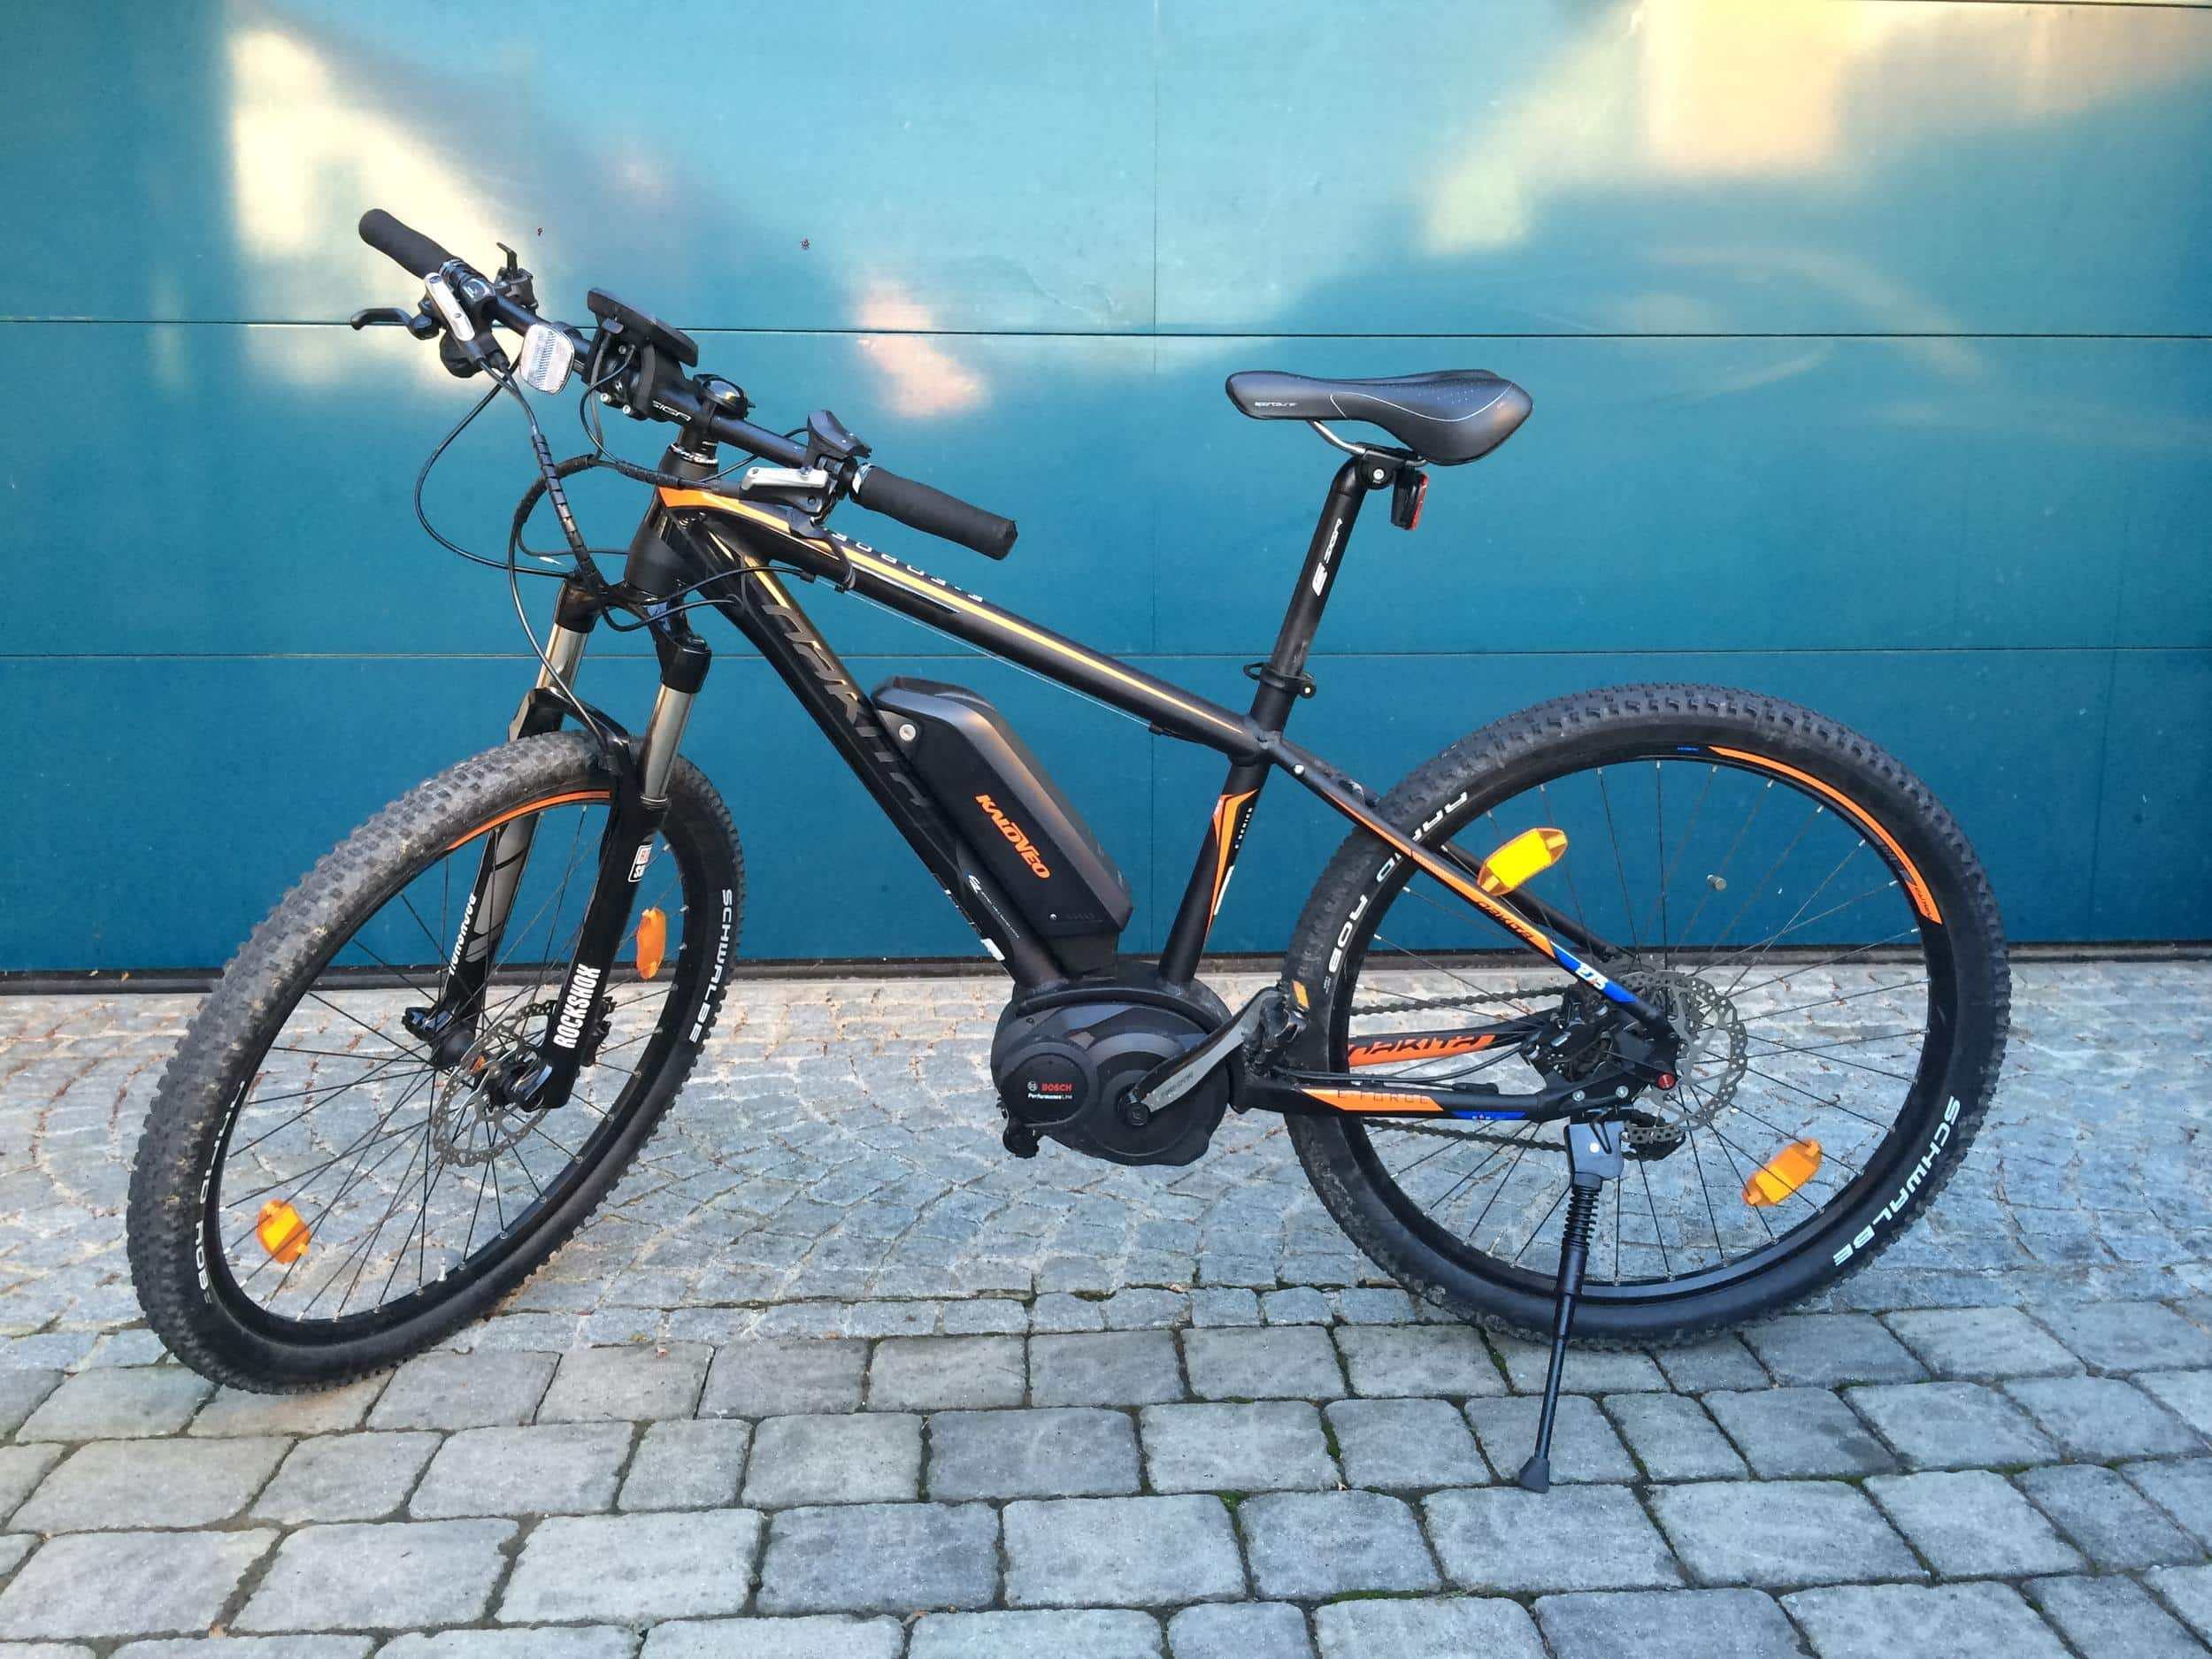 Nakita E mountainbike gebraucht